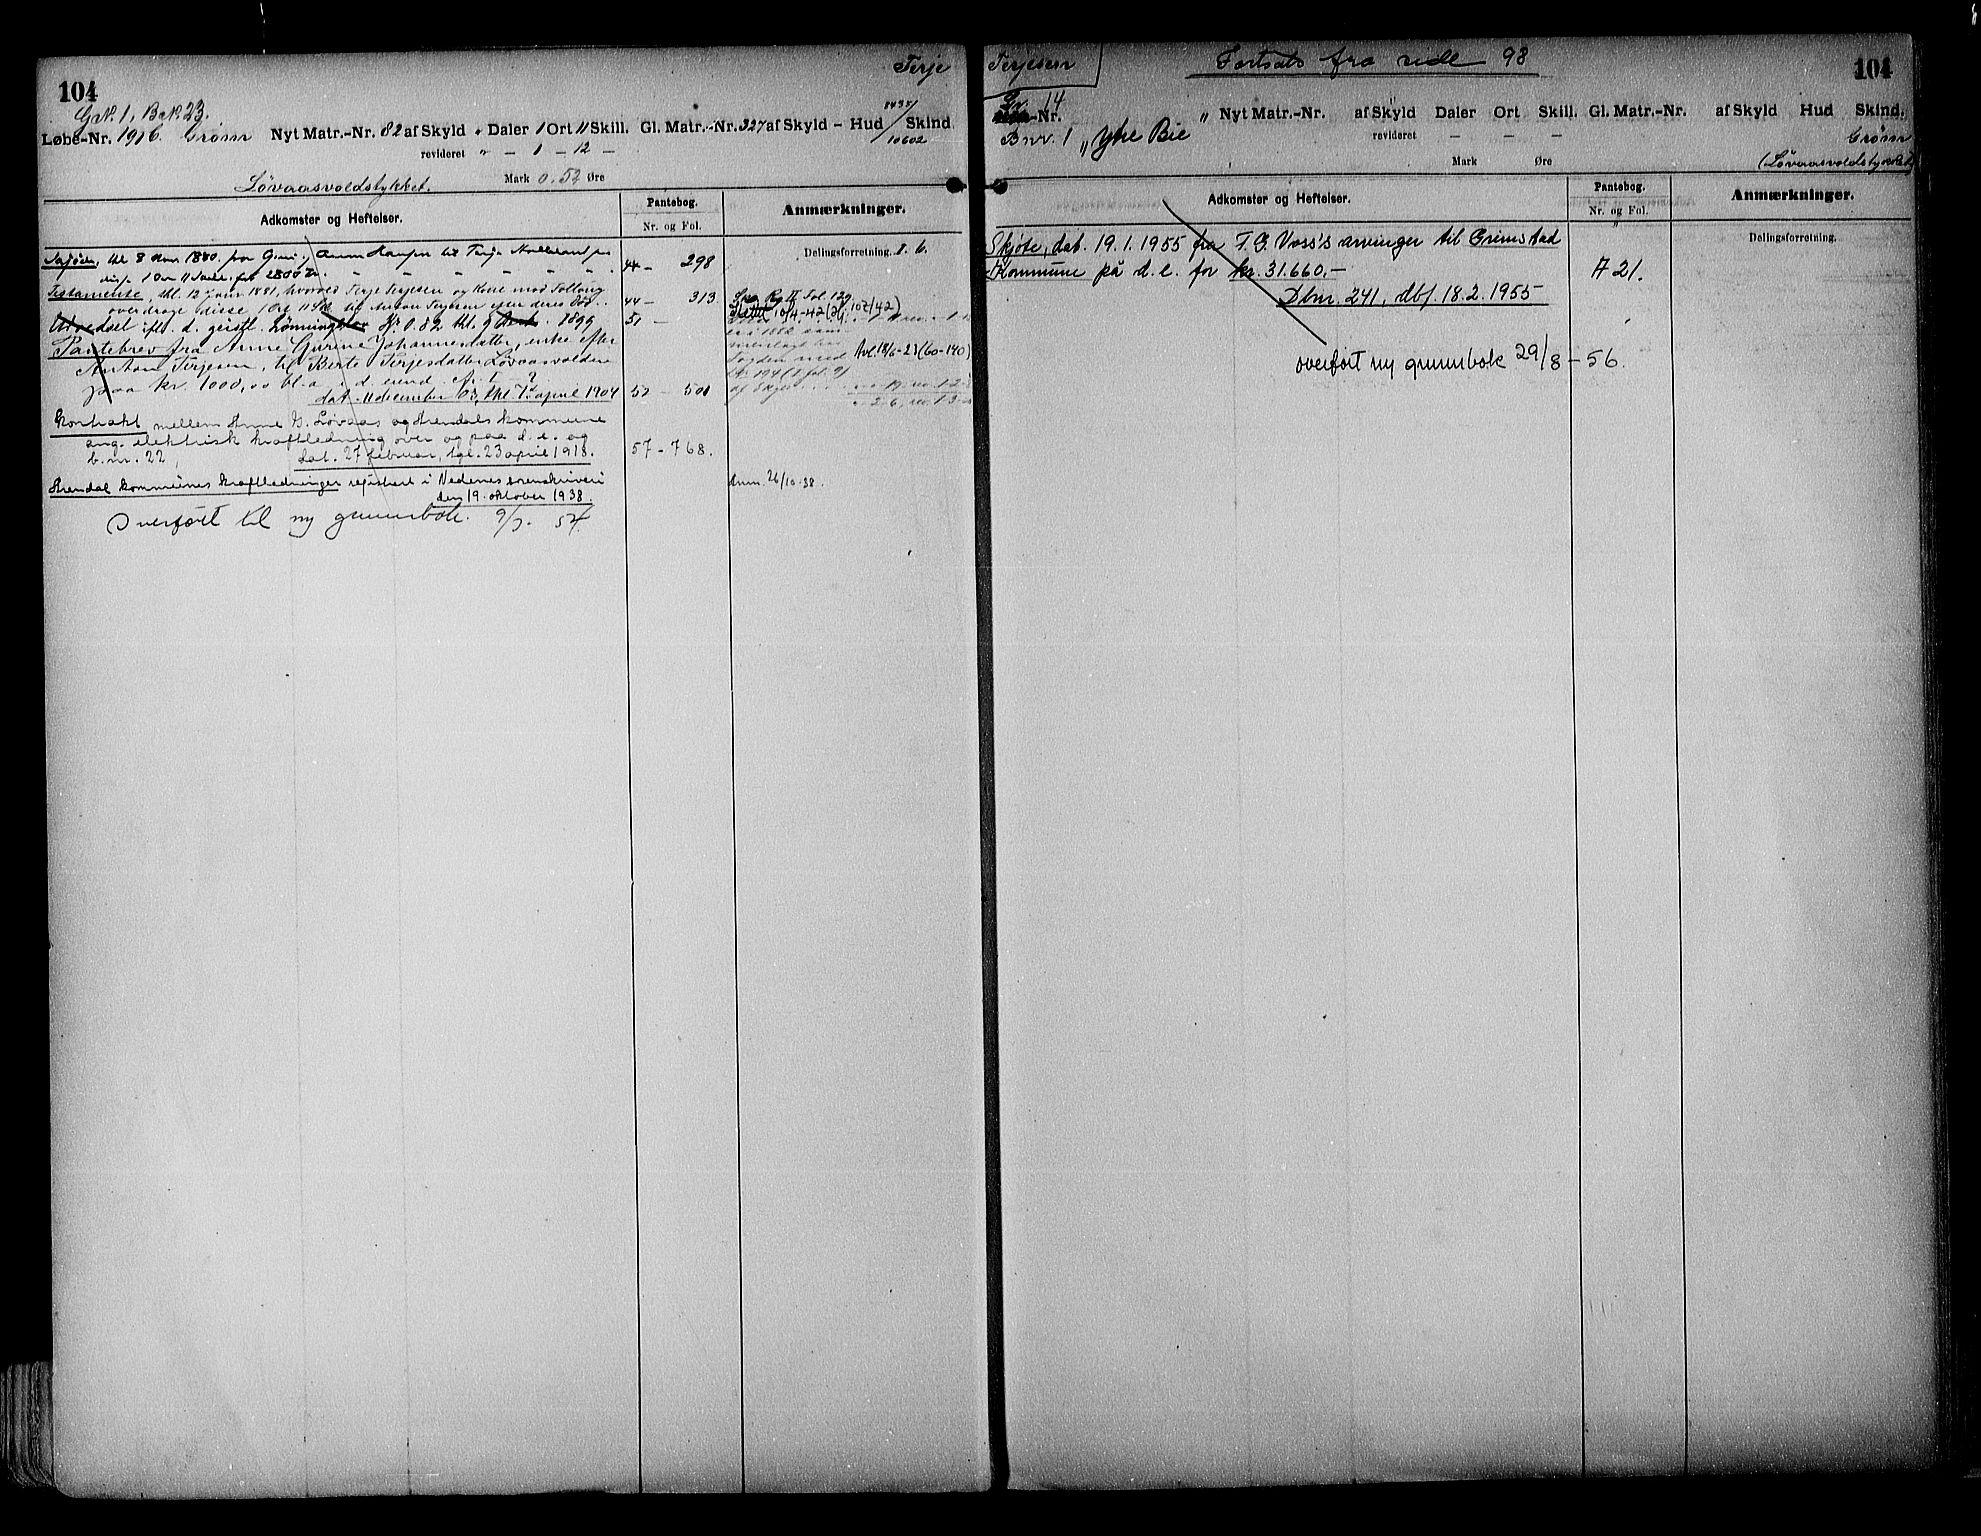 SAK, Vestre Nedenes/Sand sorenskriveri, G/Ga/L0017: Panteregister nr. 13a, 1872-1956, s. 104